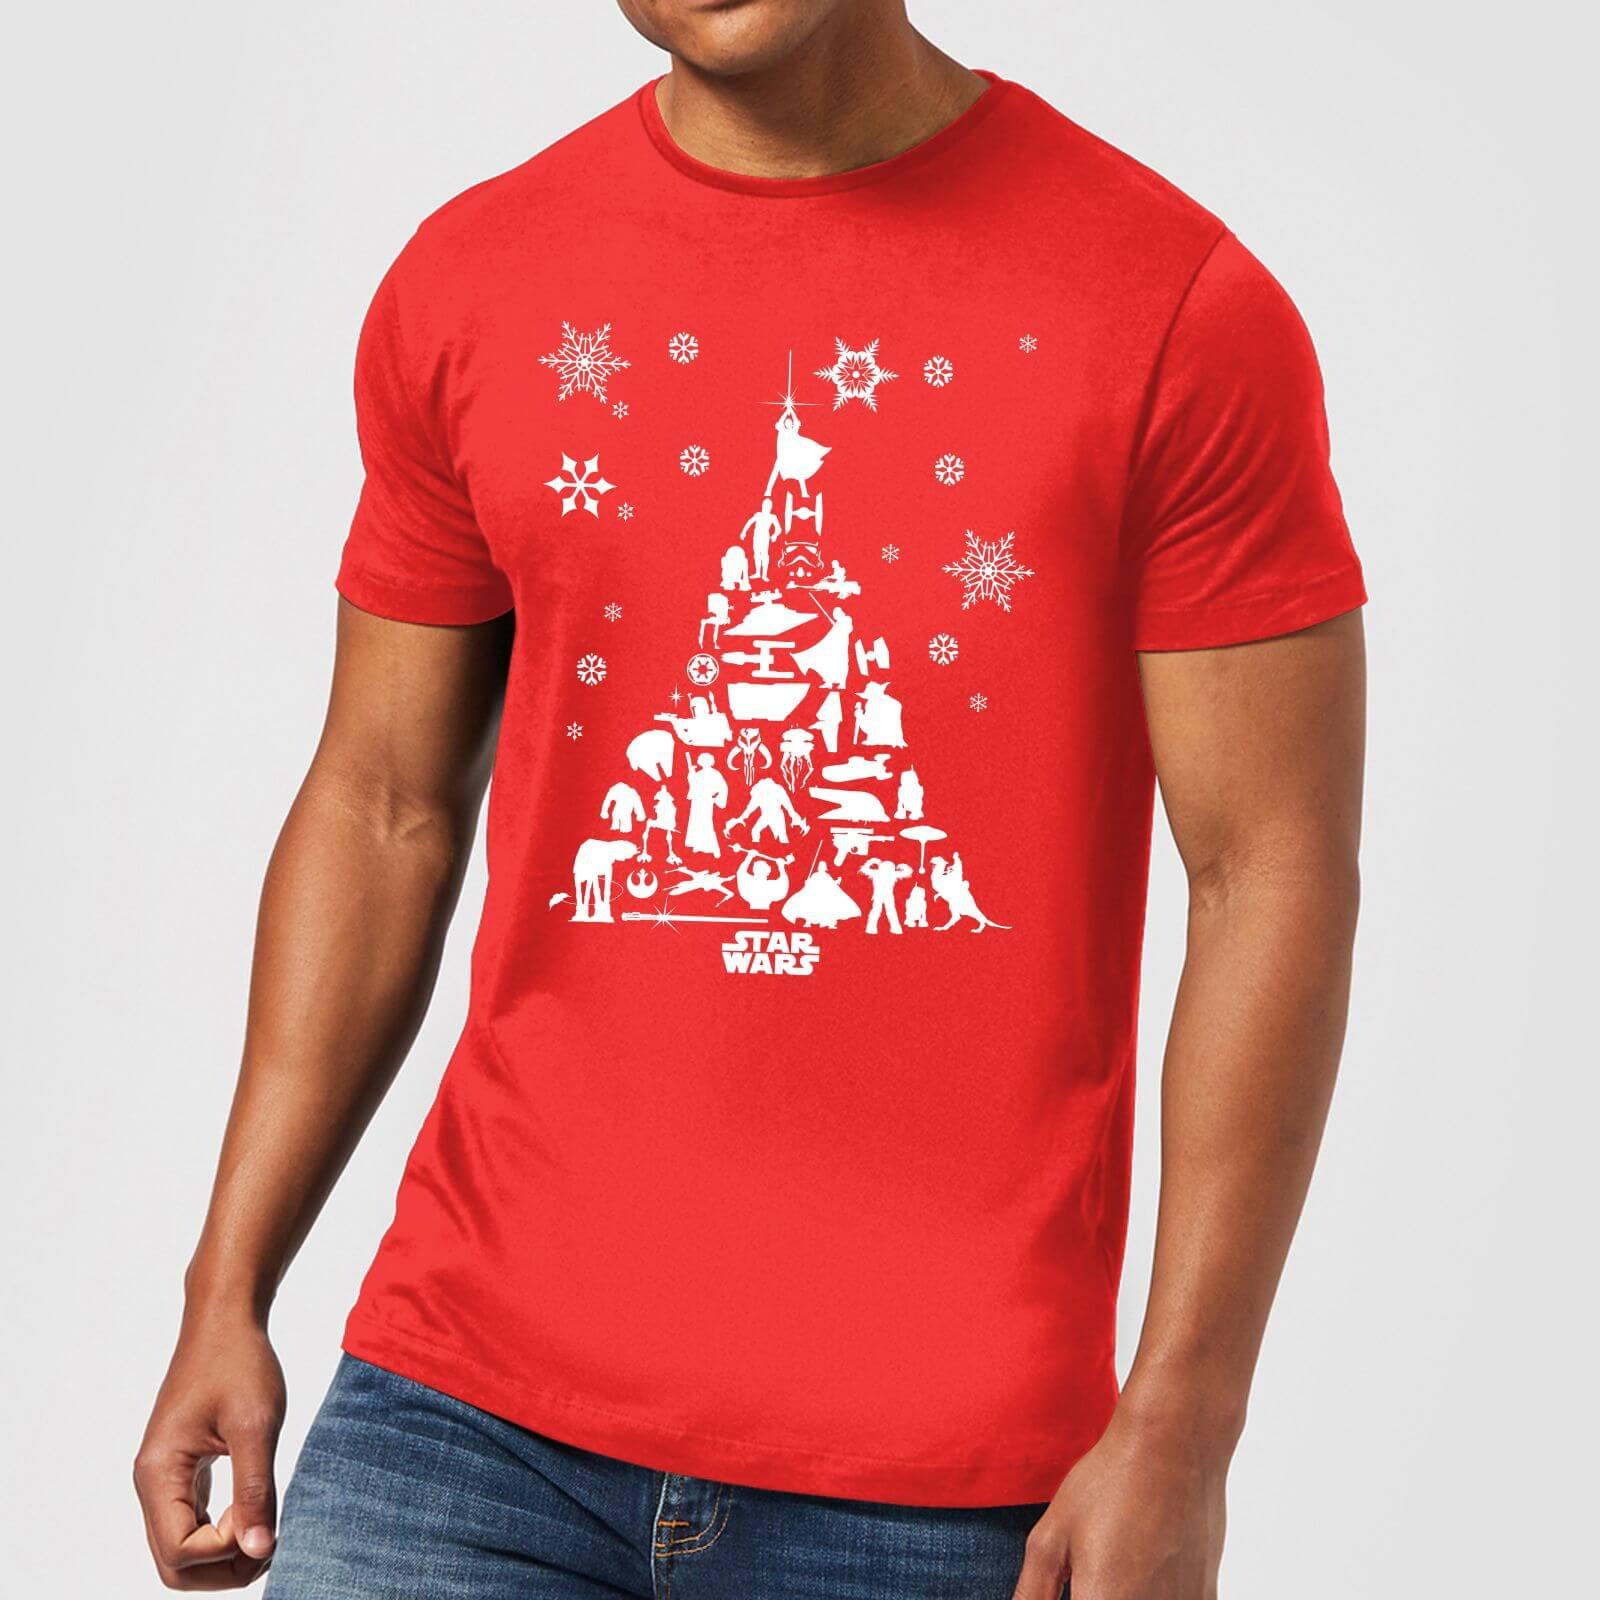 T Shirt Weihnachten.Star Wars Weihnachten Character Tree T Shirt Rot